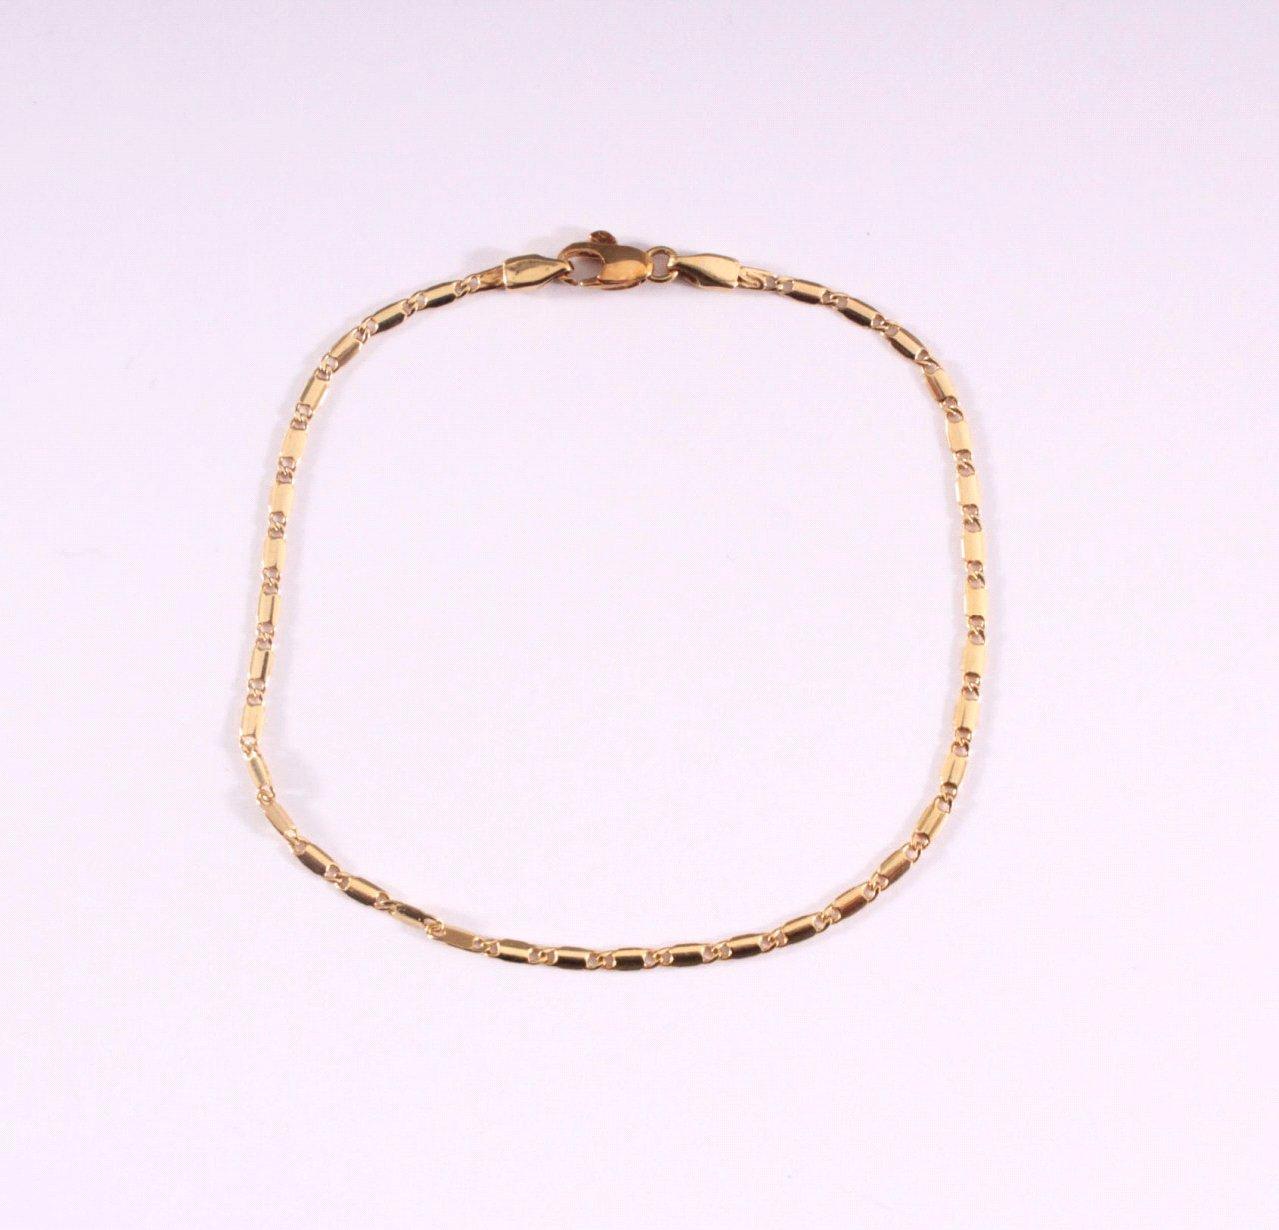 Armband aus 8 Karat Gelbgold